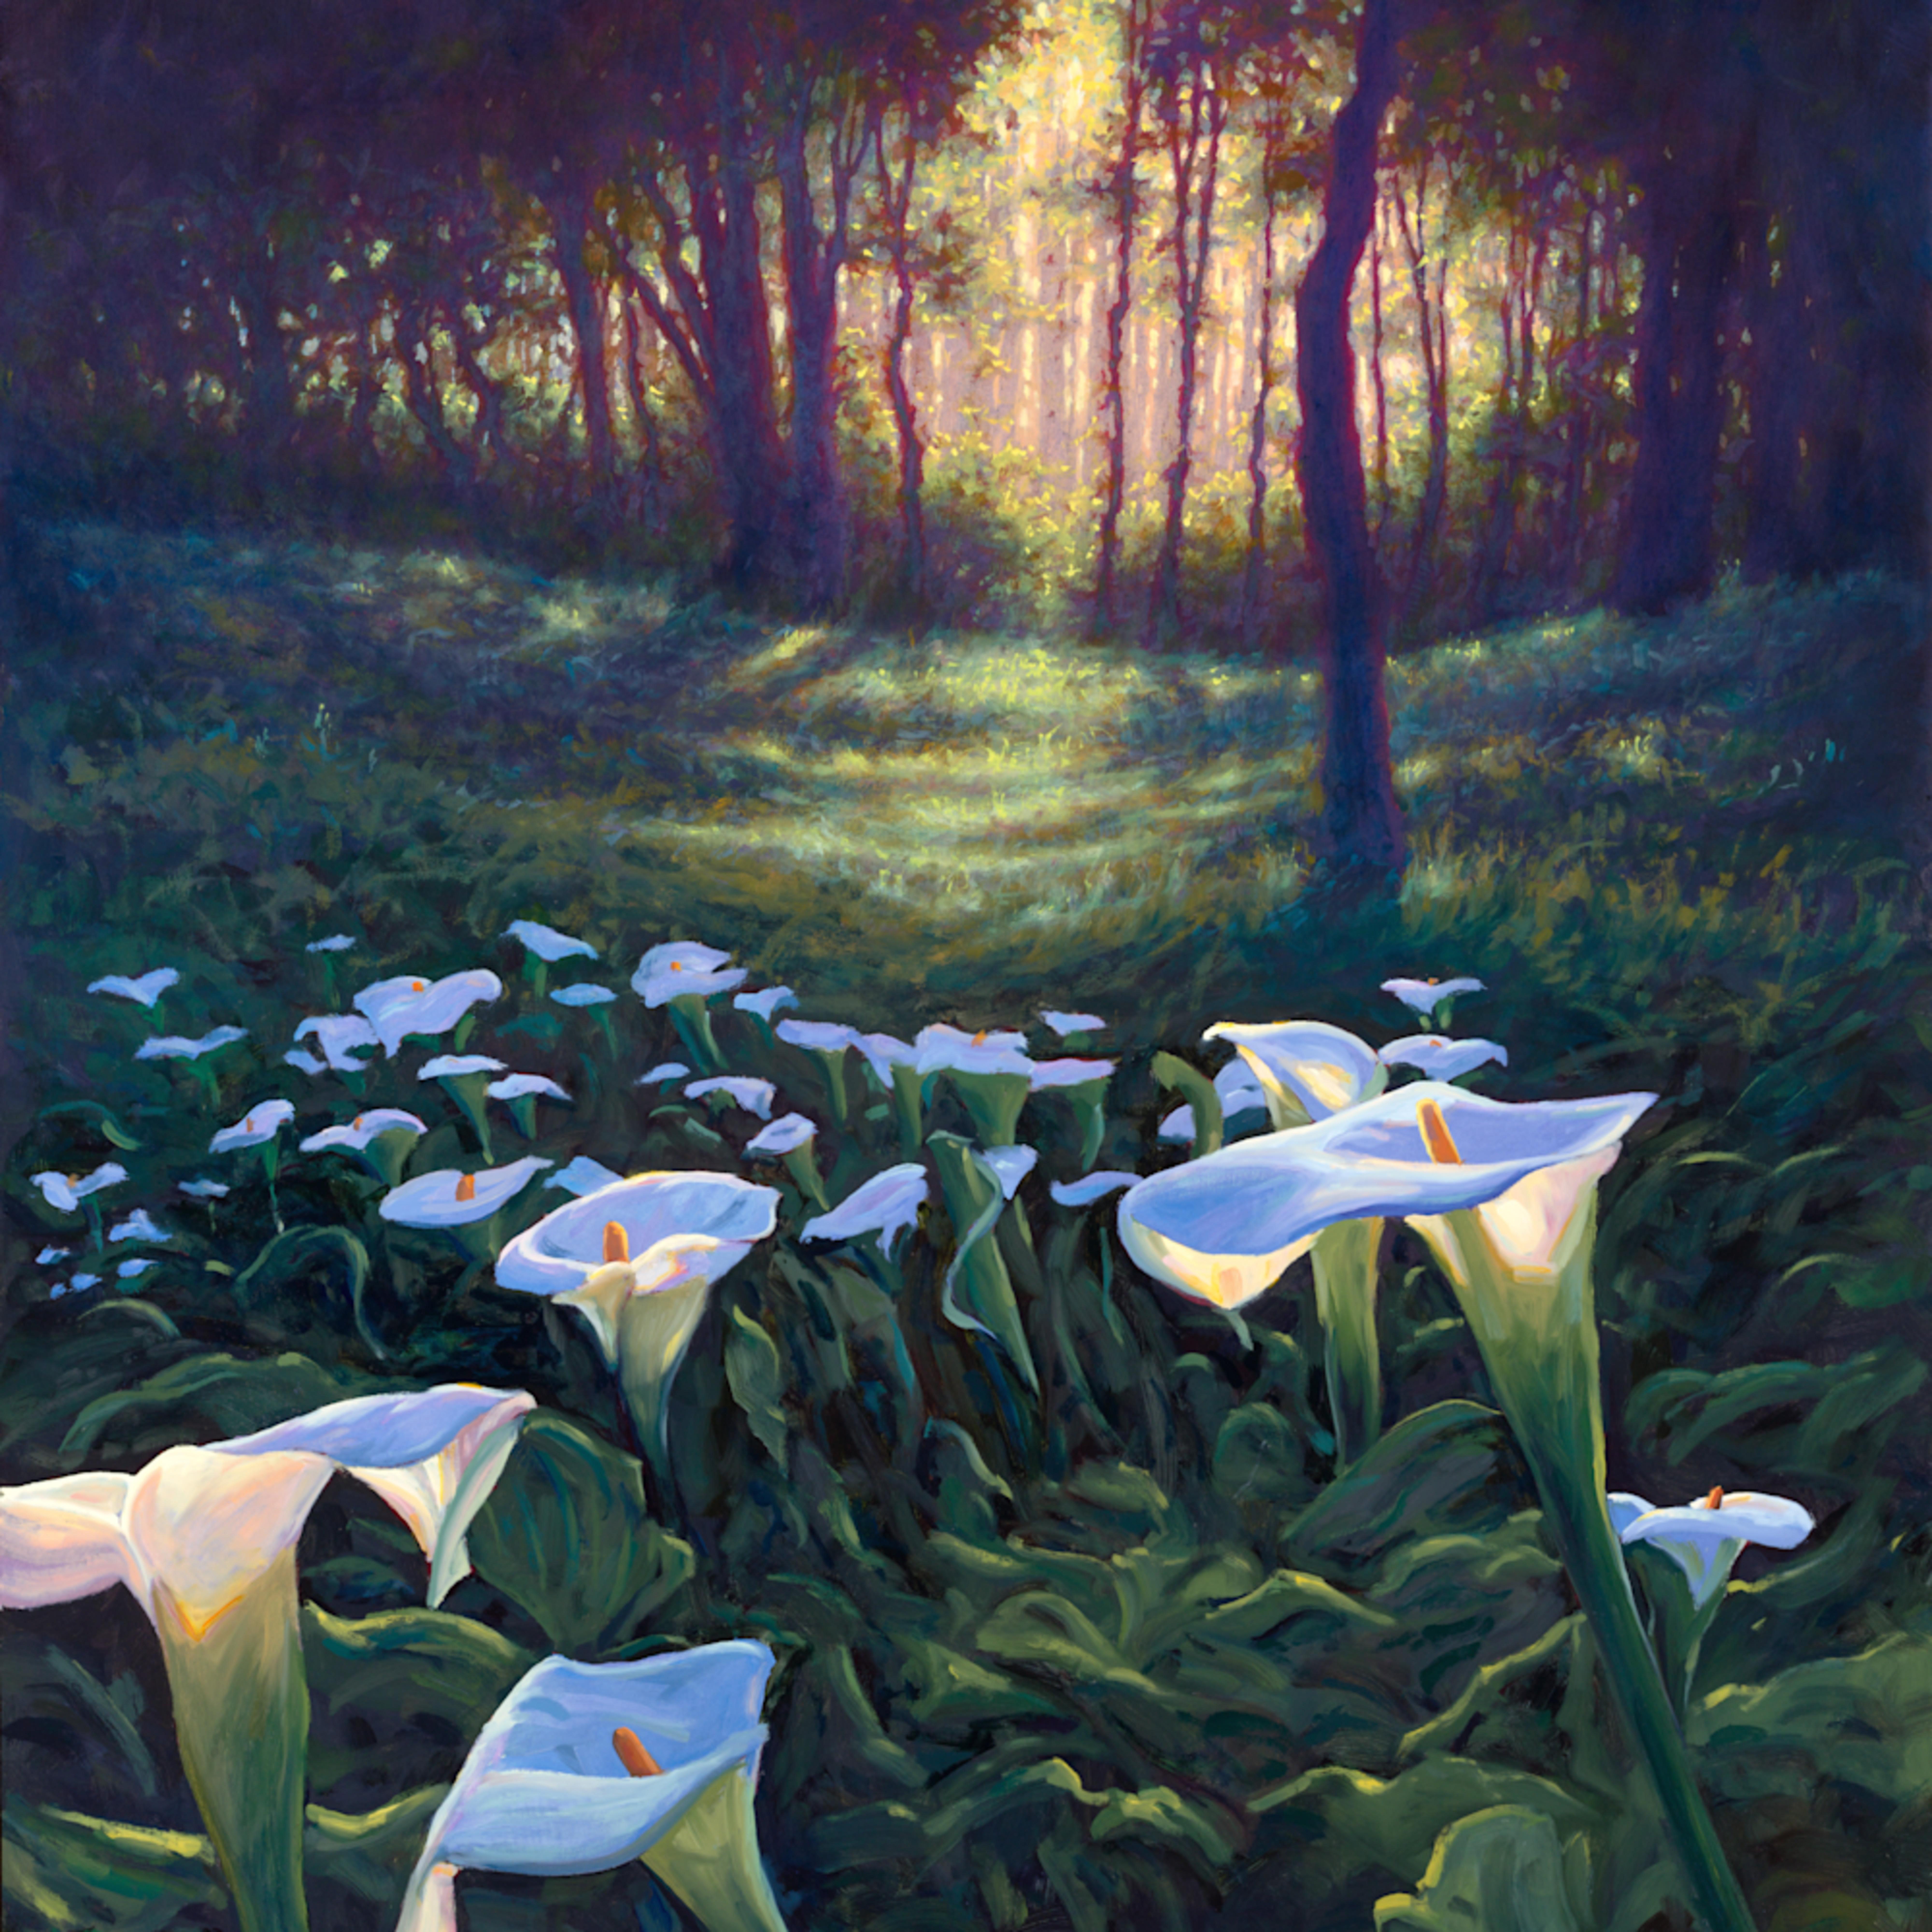 Zantedeschia trail  calla lillies  36x48 oils on panel 5300 large print ciwjdi